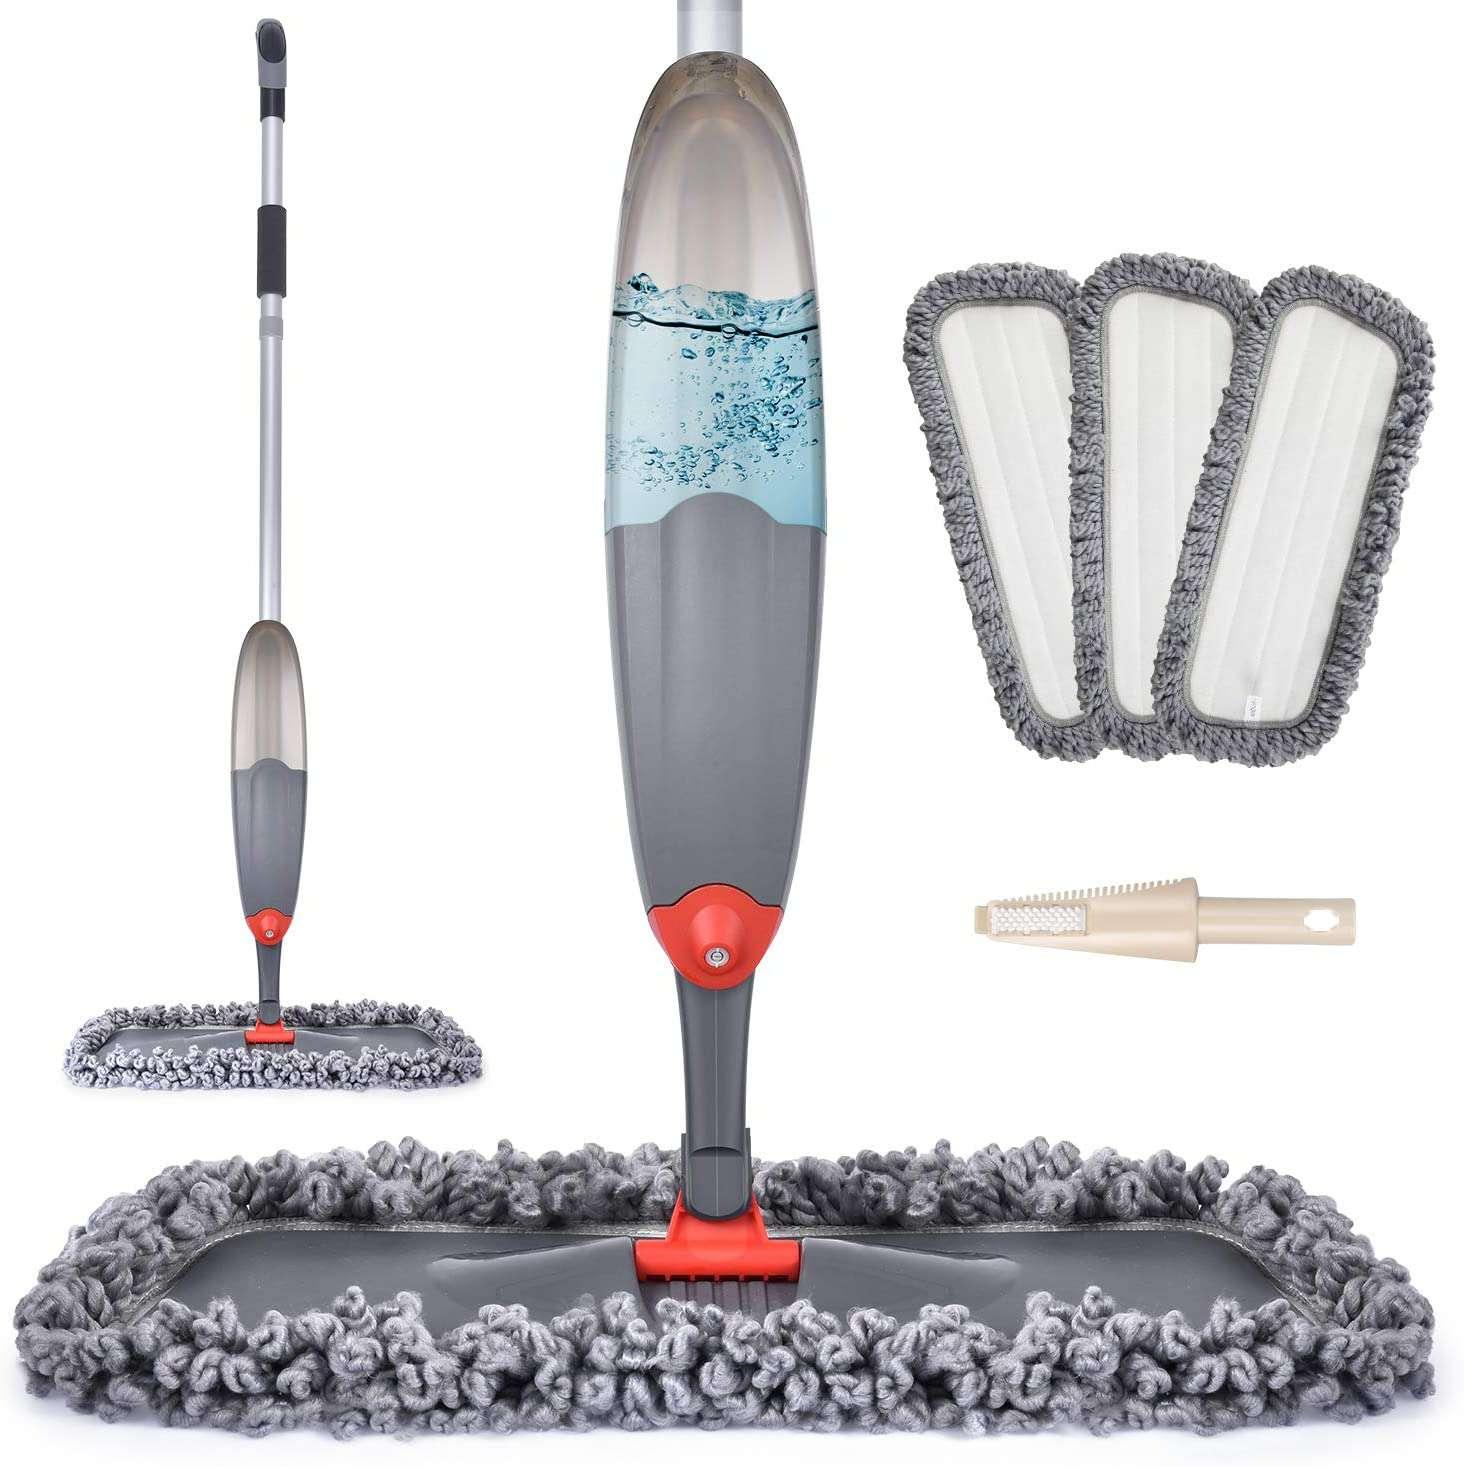 Domi-patrol Spray Mop for Floor Cleaning